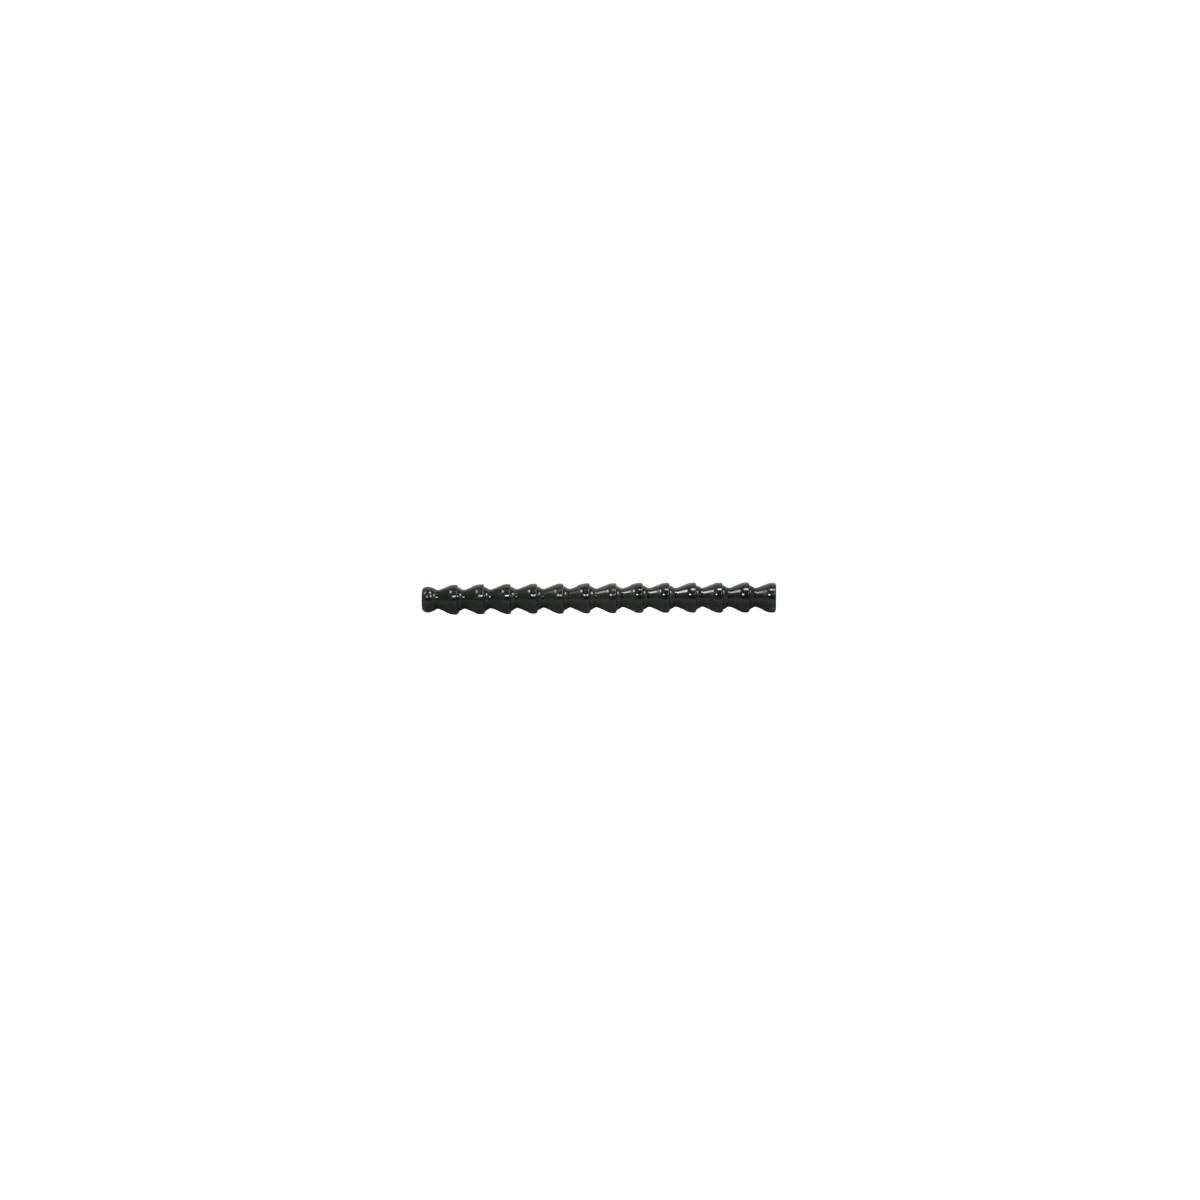 "Sola 1/2"" Locline Arm"